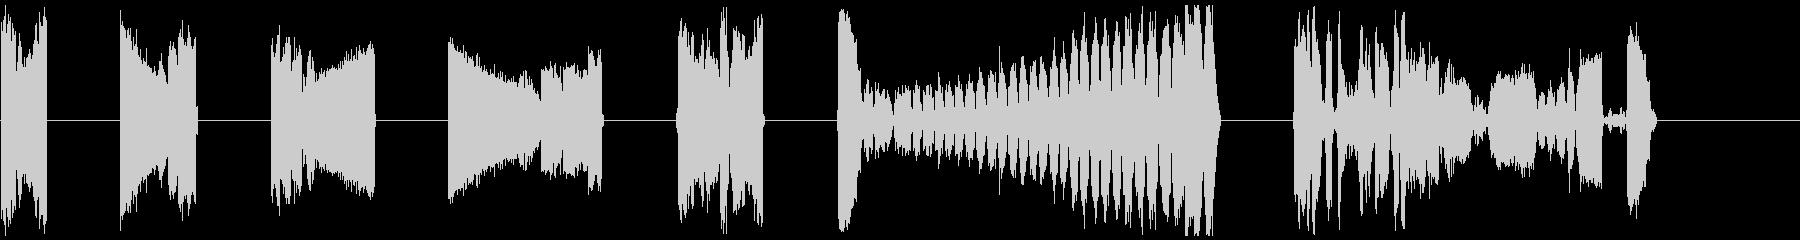 DJ歯科医ドリルX7の未再生の波形